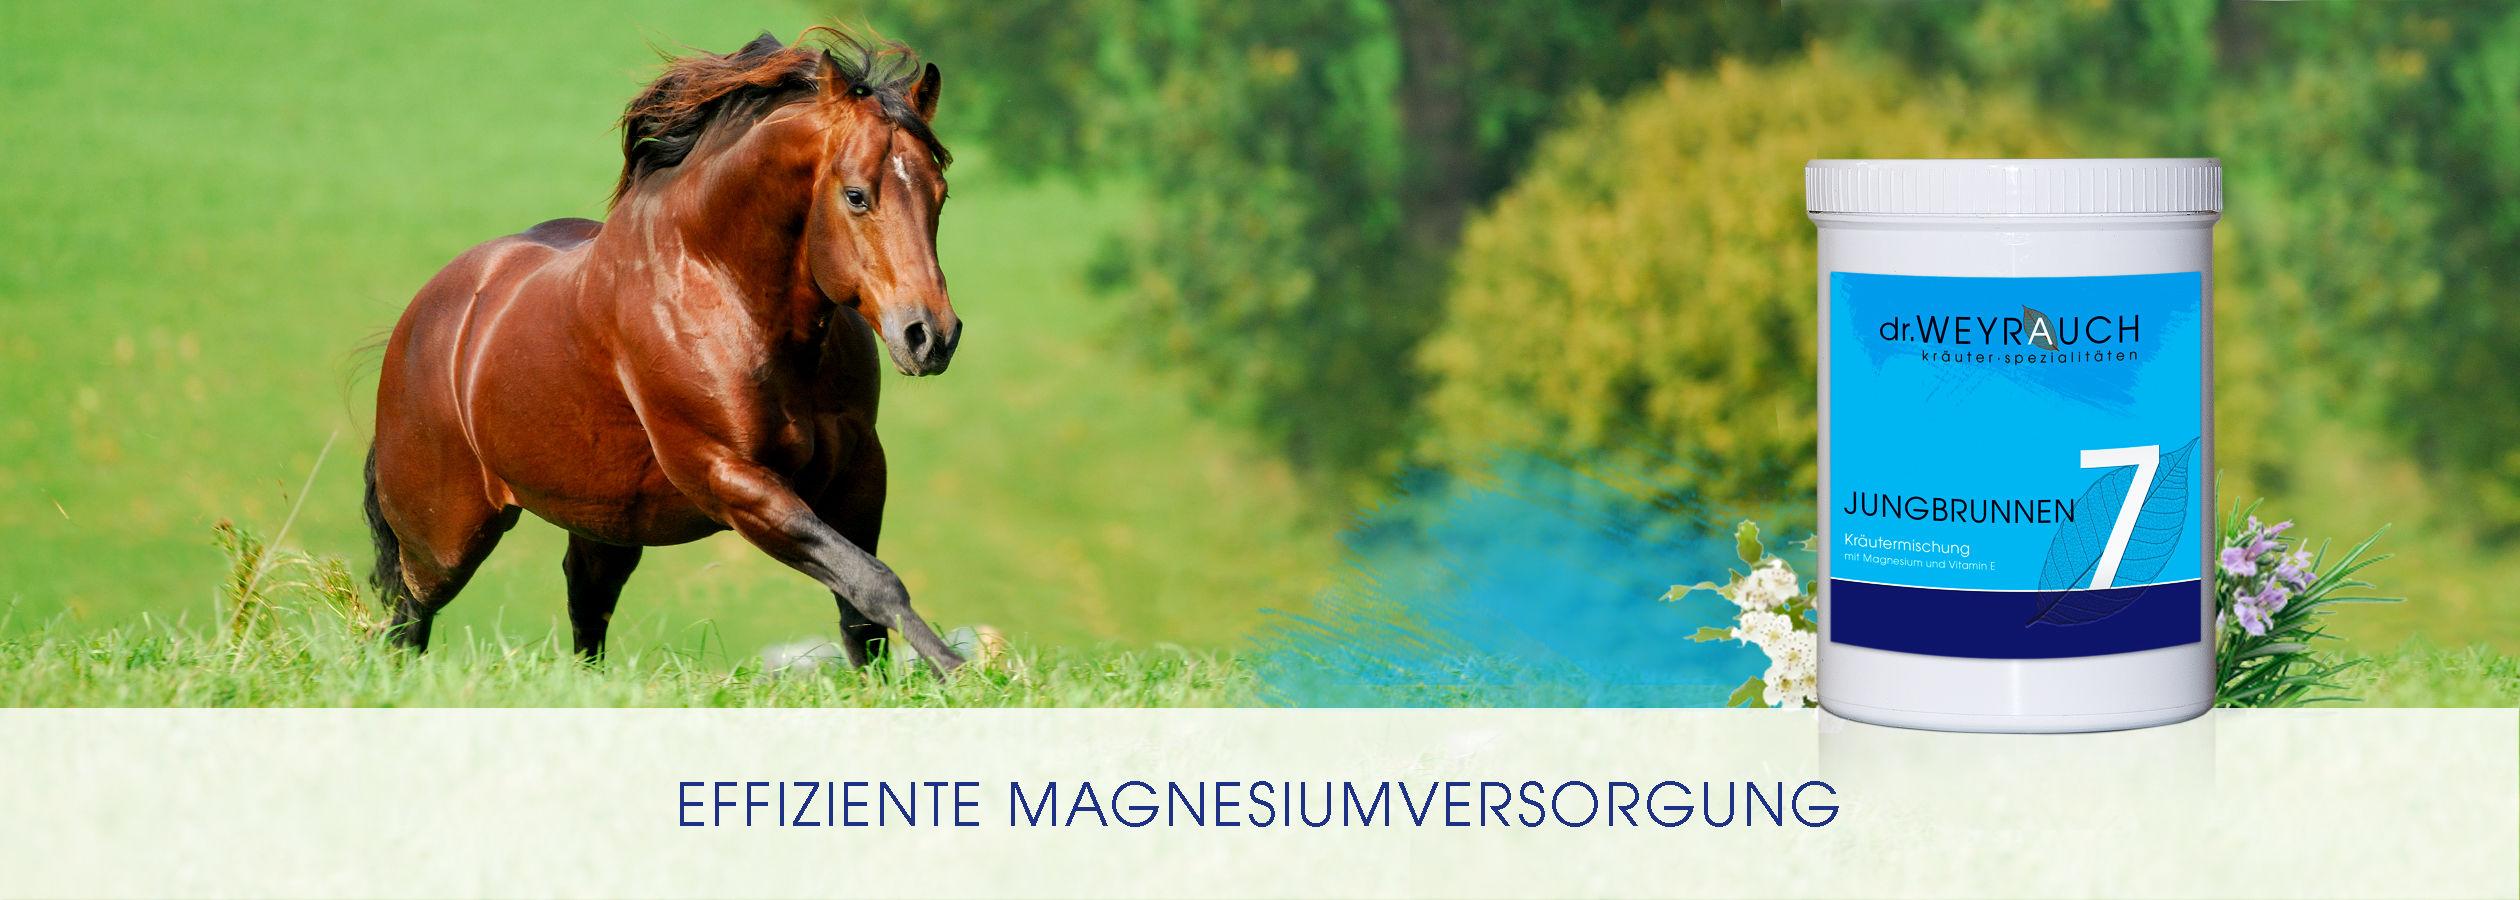 Header-2017-7-Jungbrunnen-Pferd